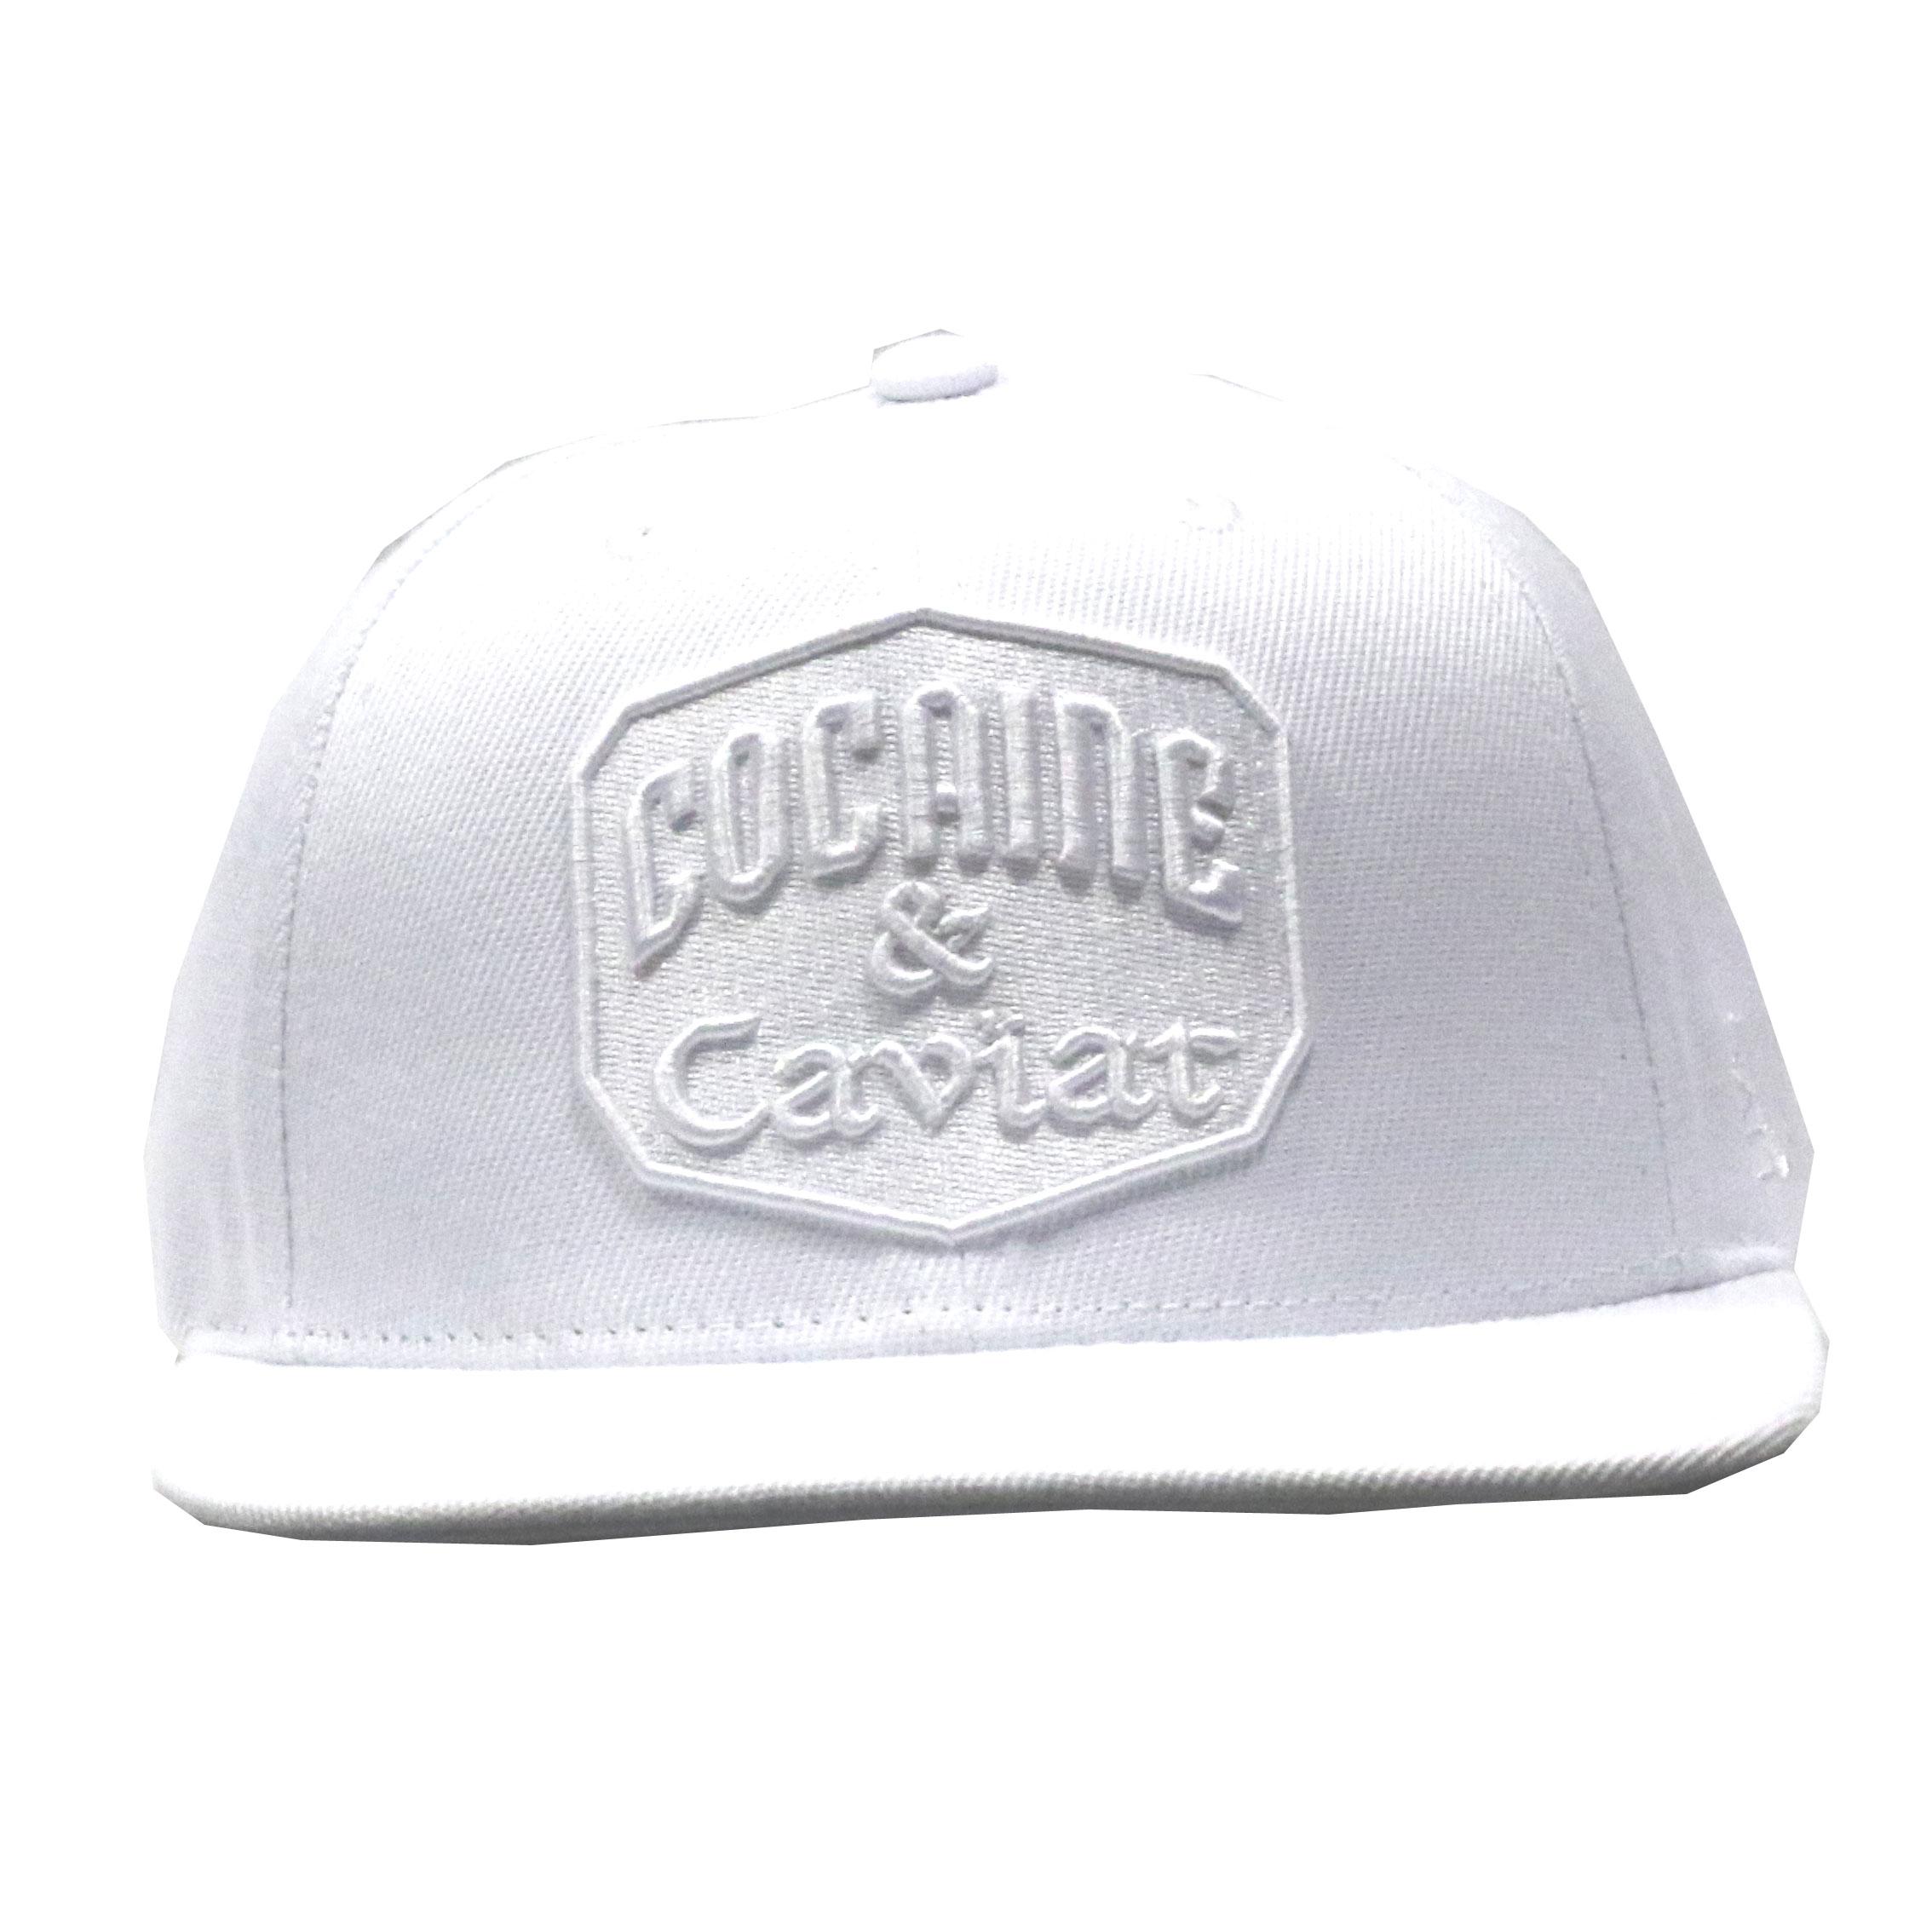 33-cocaine-white-back cocavwhitefr cocawhiteside. ‹ Back to All Caps.   5c64cd634614